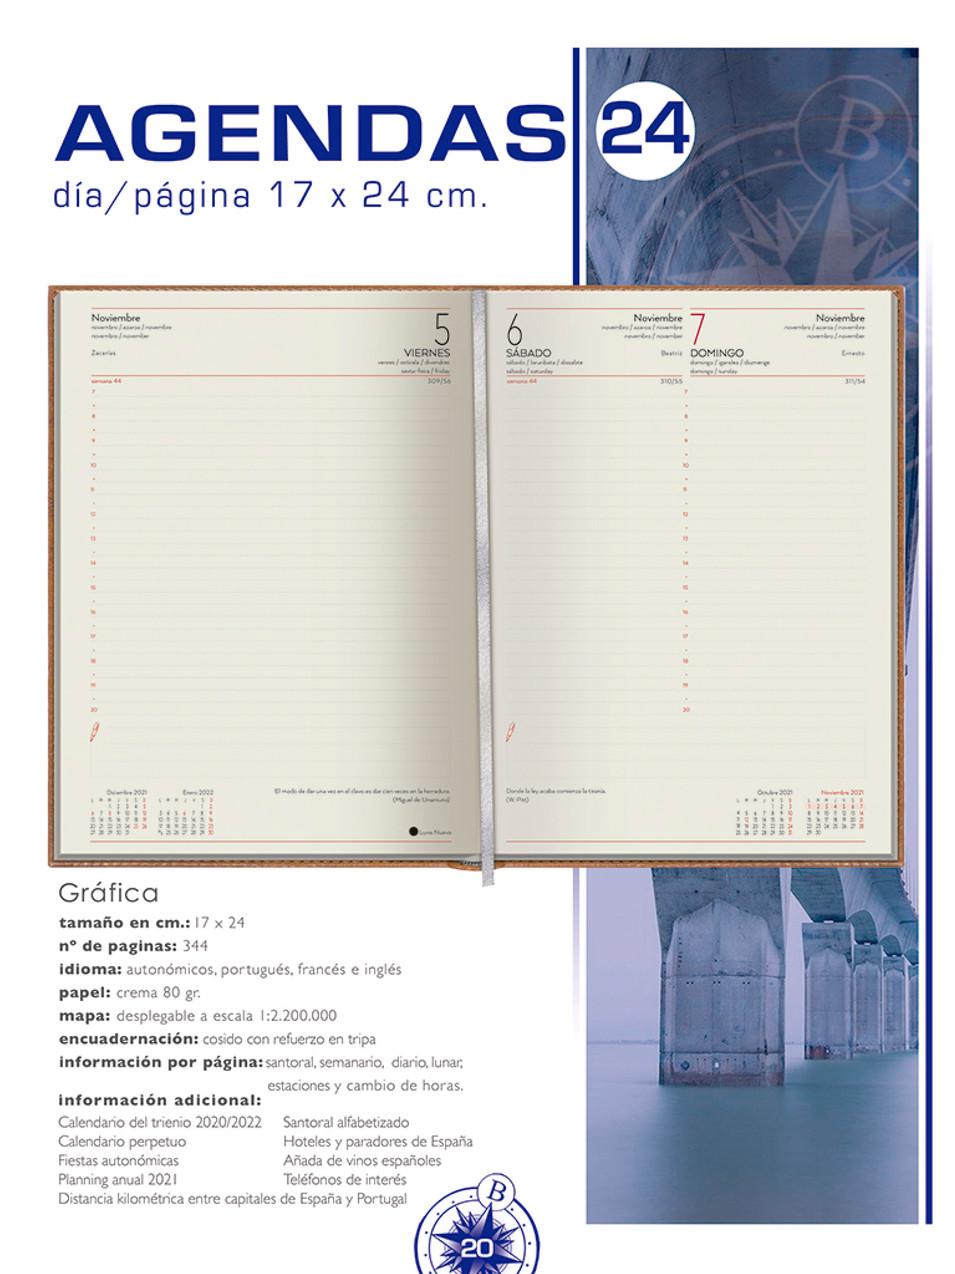 AGENDARIO BITACORA 2021-22.jpg